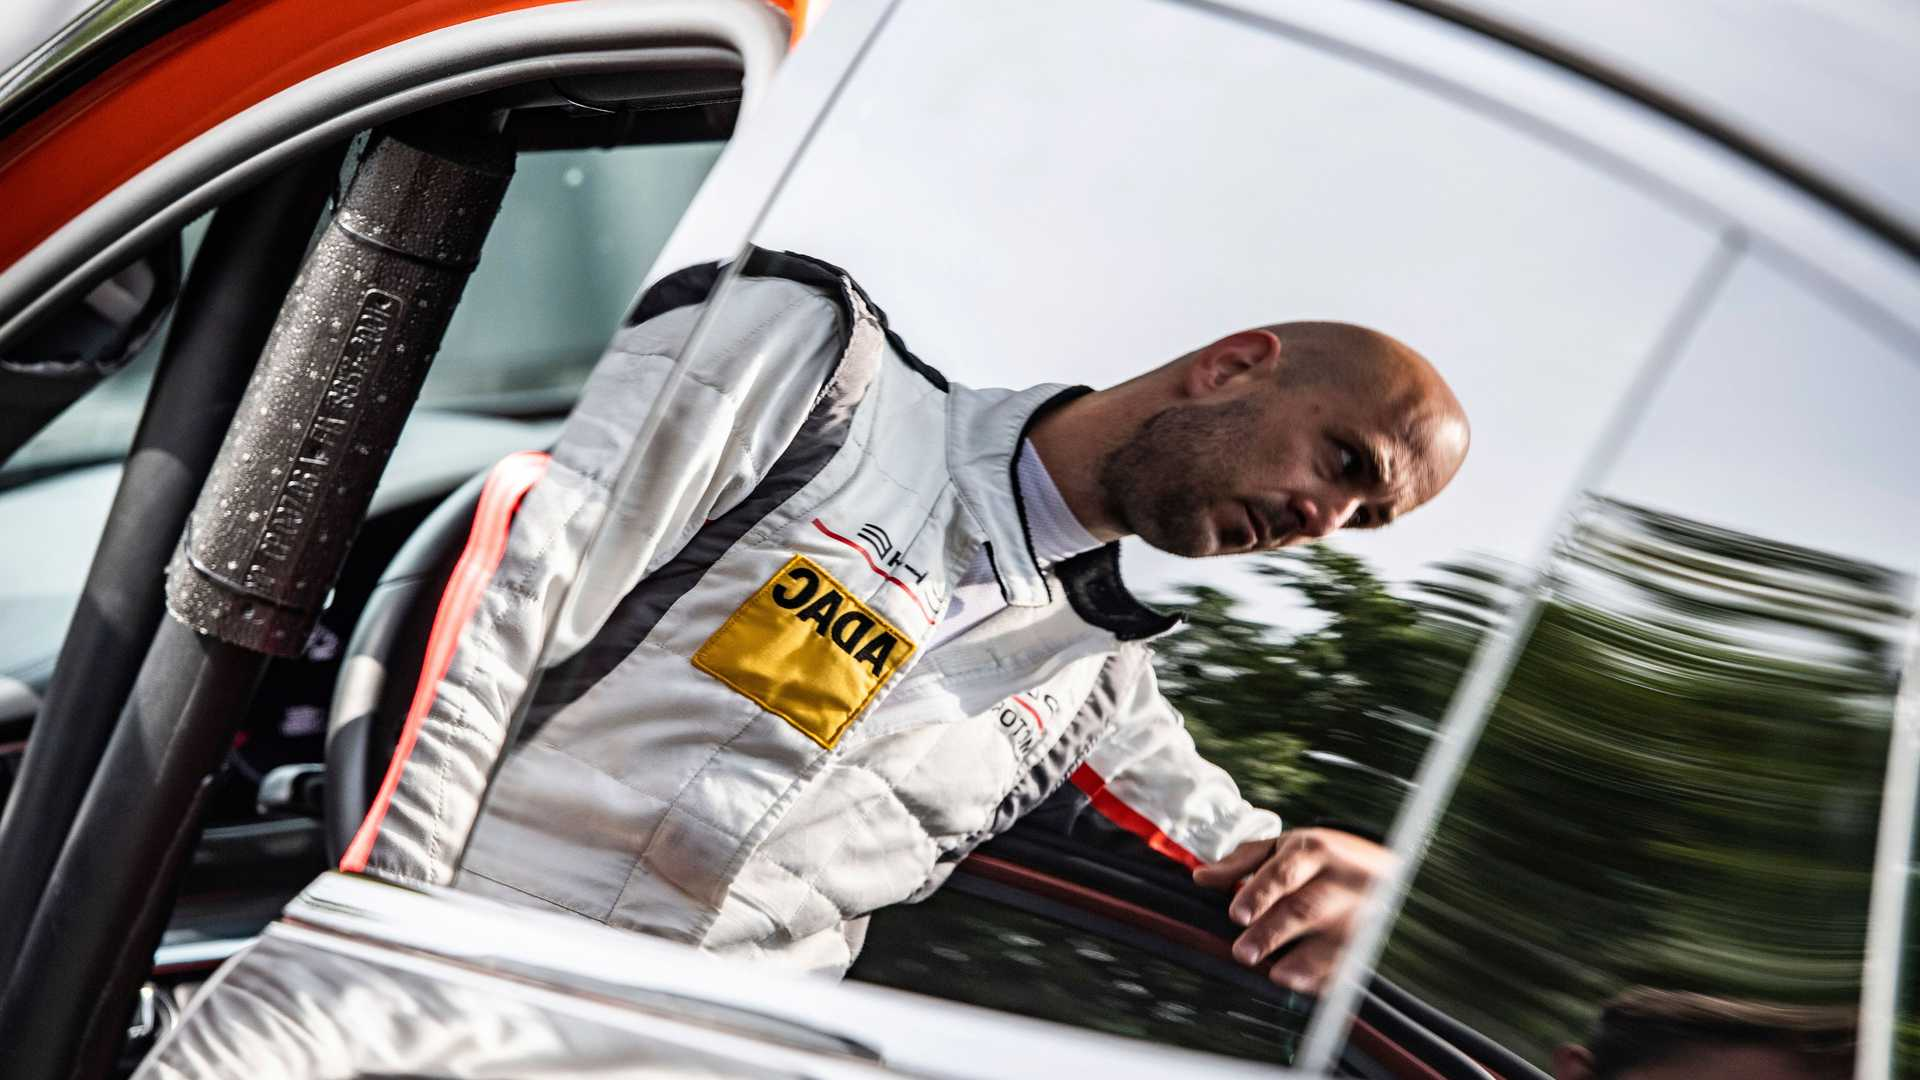 2021-porsche-panamera-sets-fastest-four-door-porsche-record-at-the-nurburgring-9